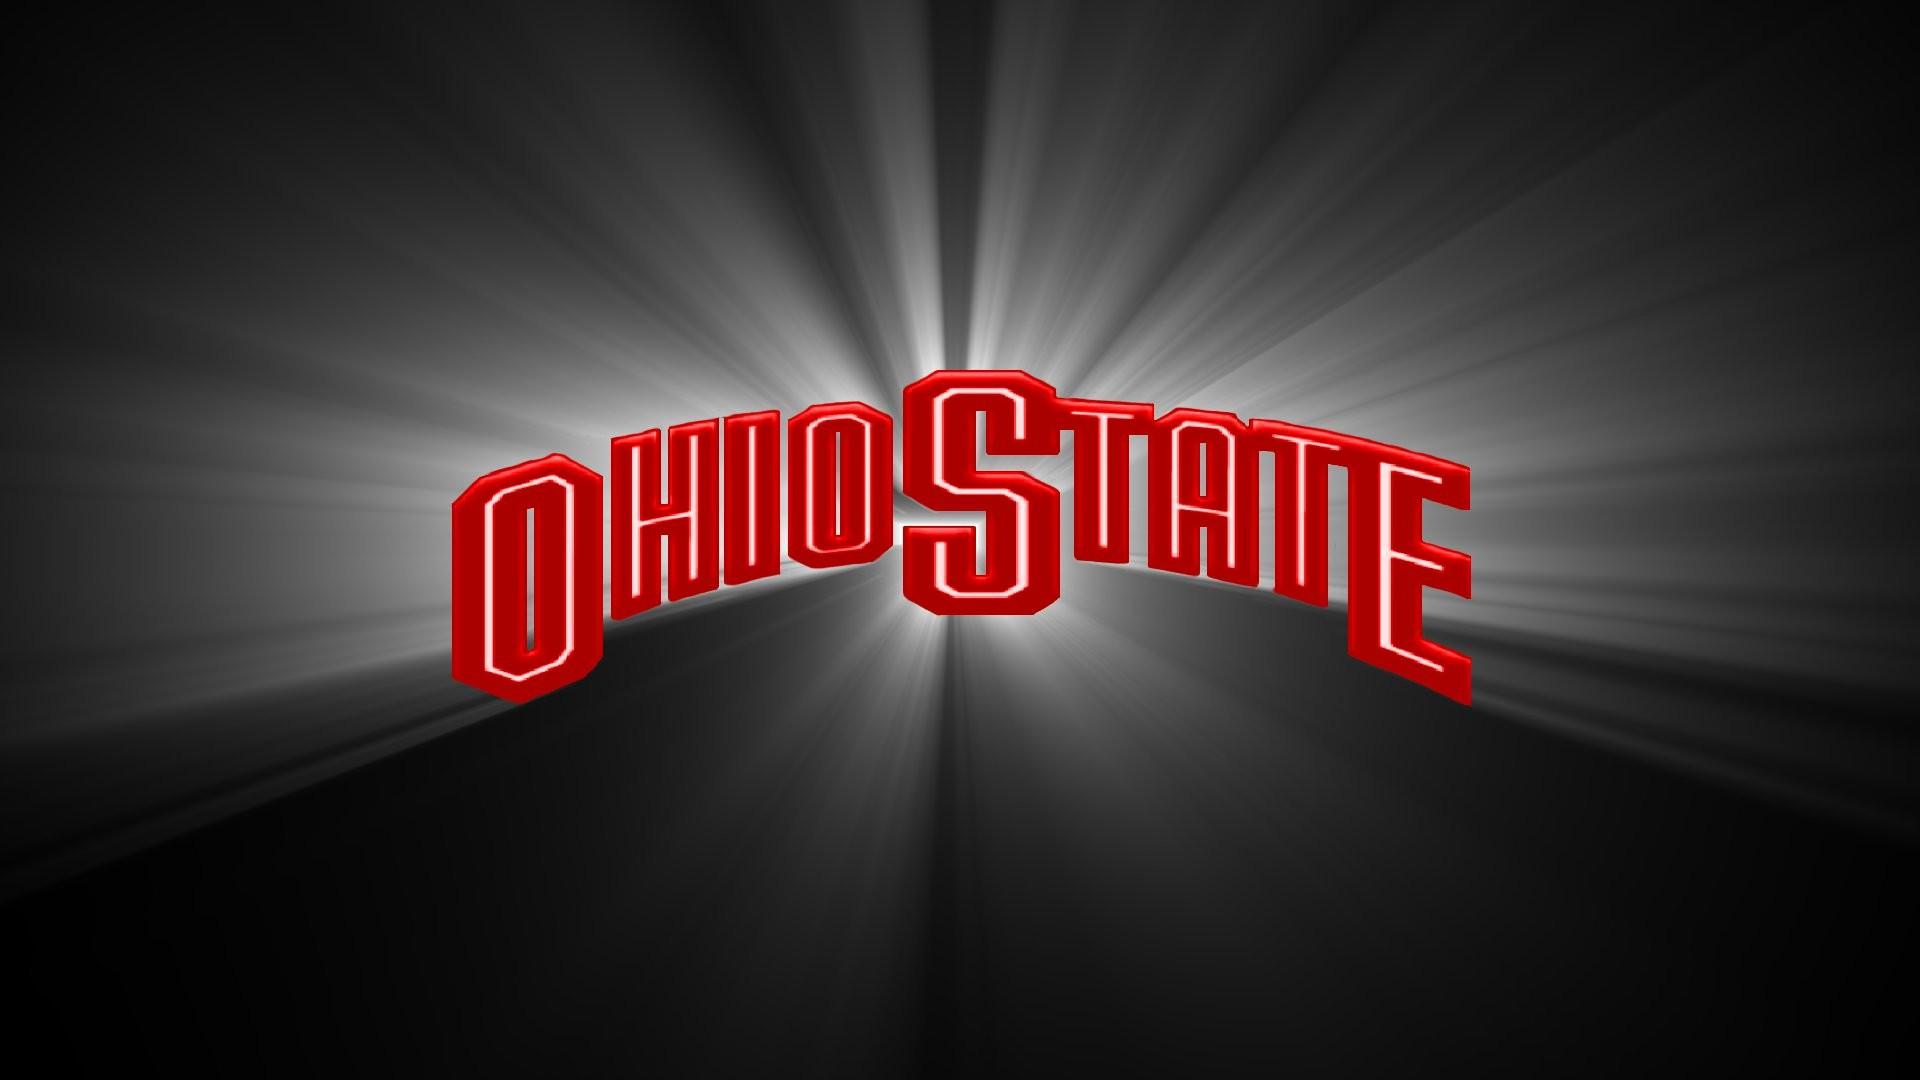 Ohio State Desktop Wallpapers on Behance